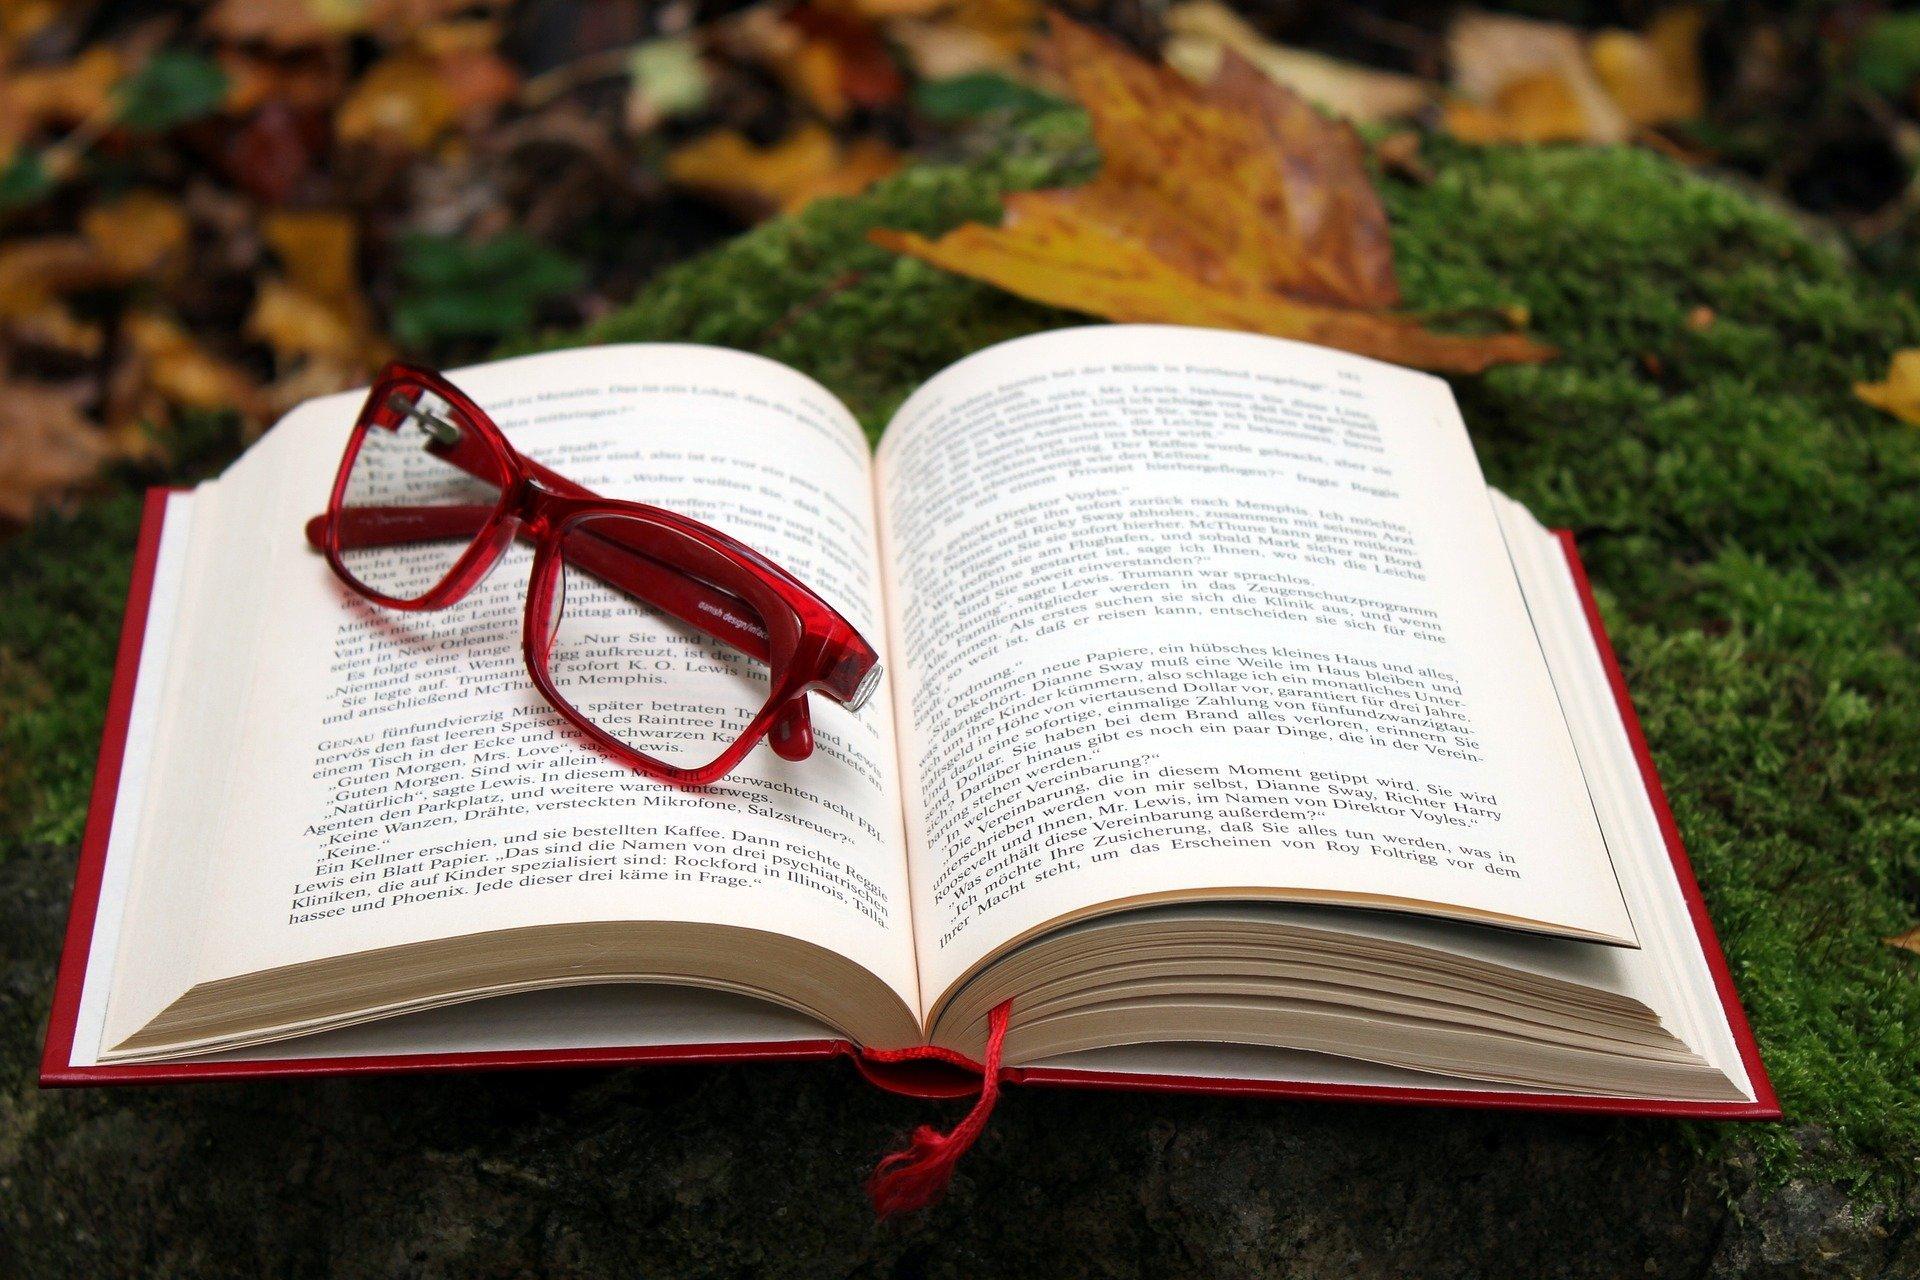 Libros que arrasarán este otoño